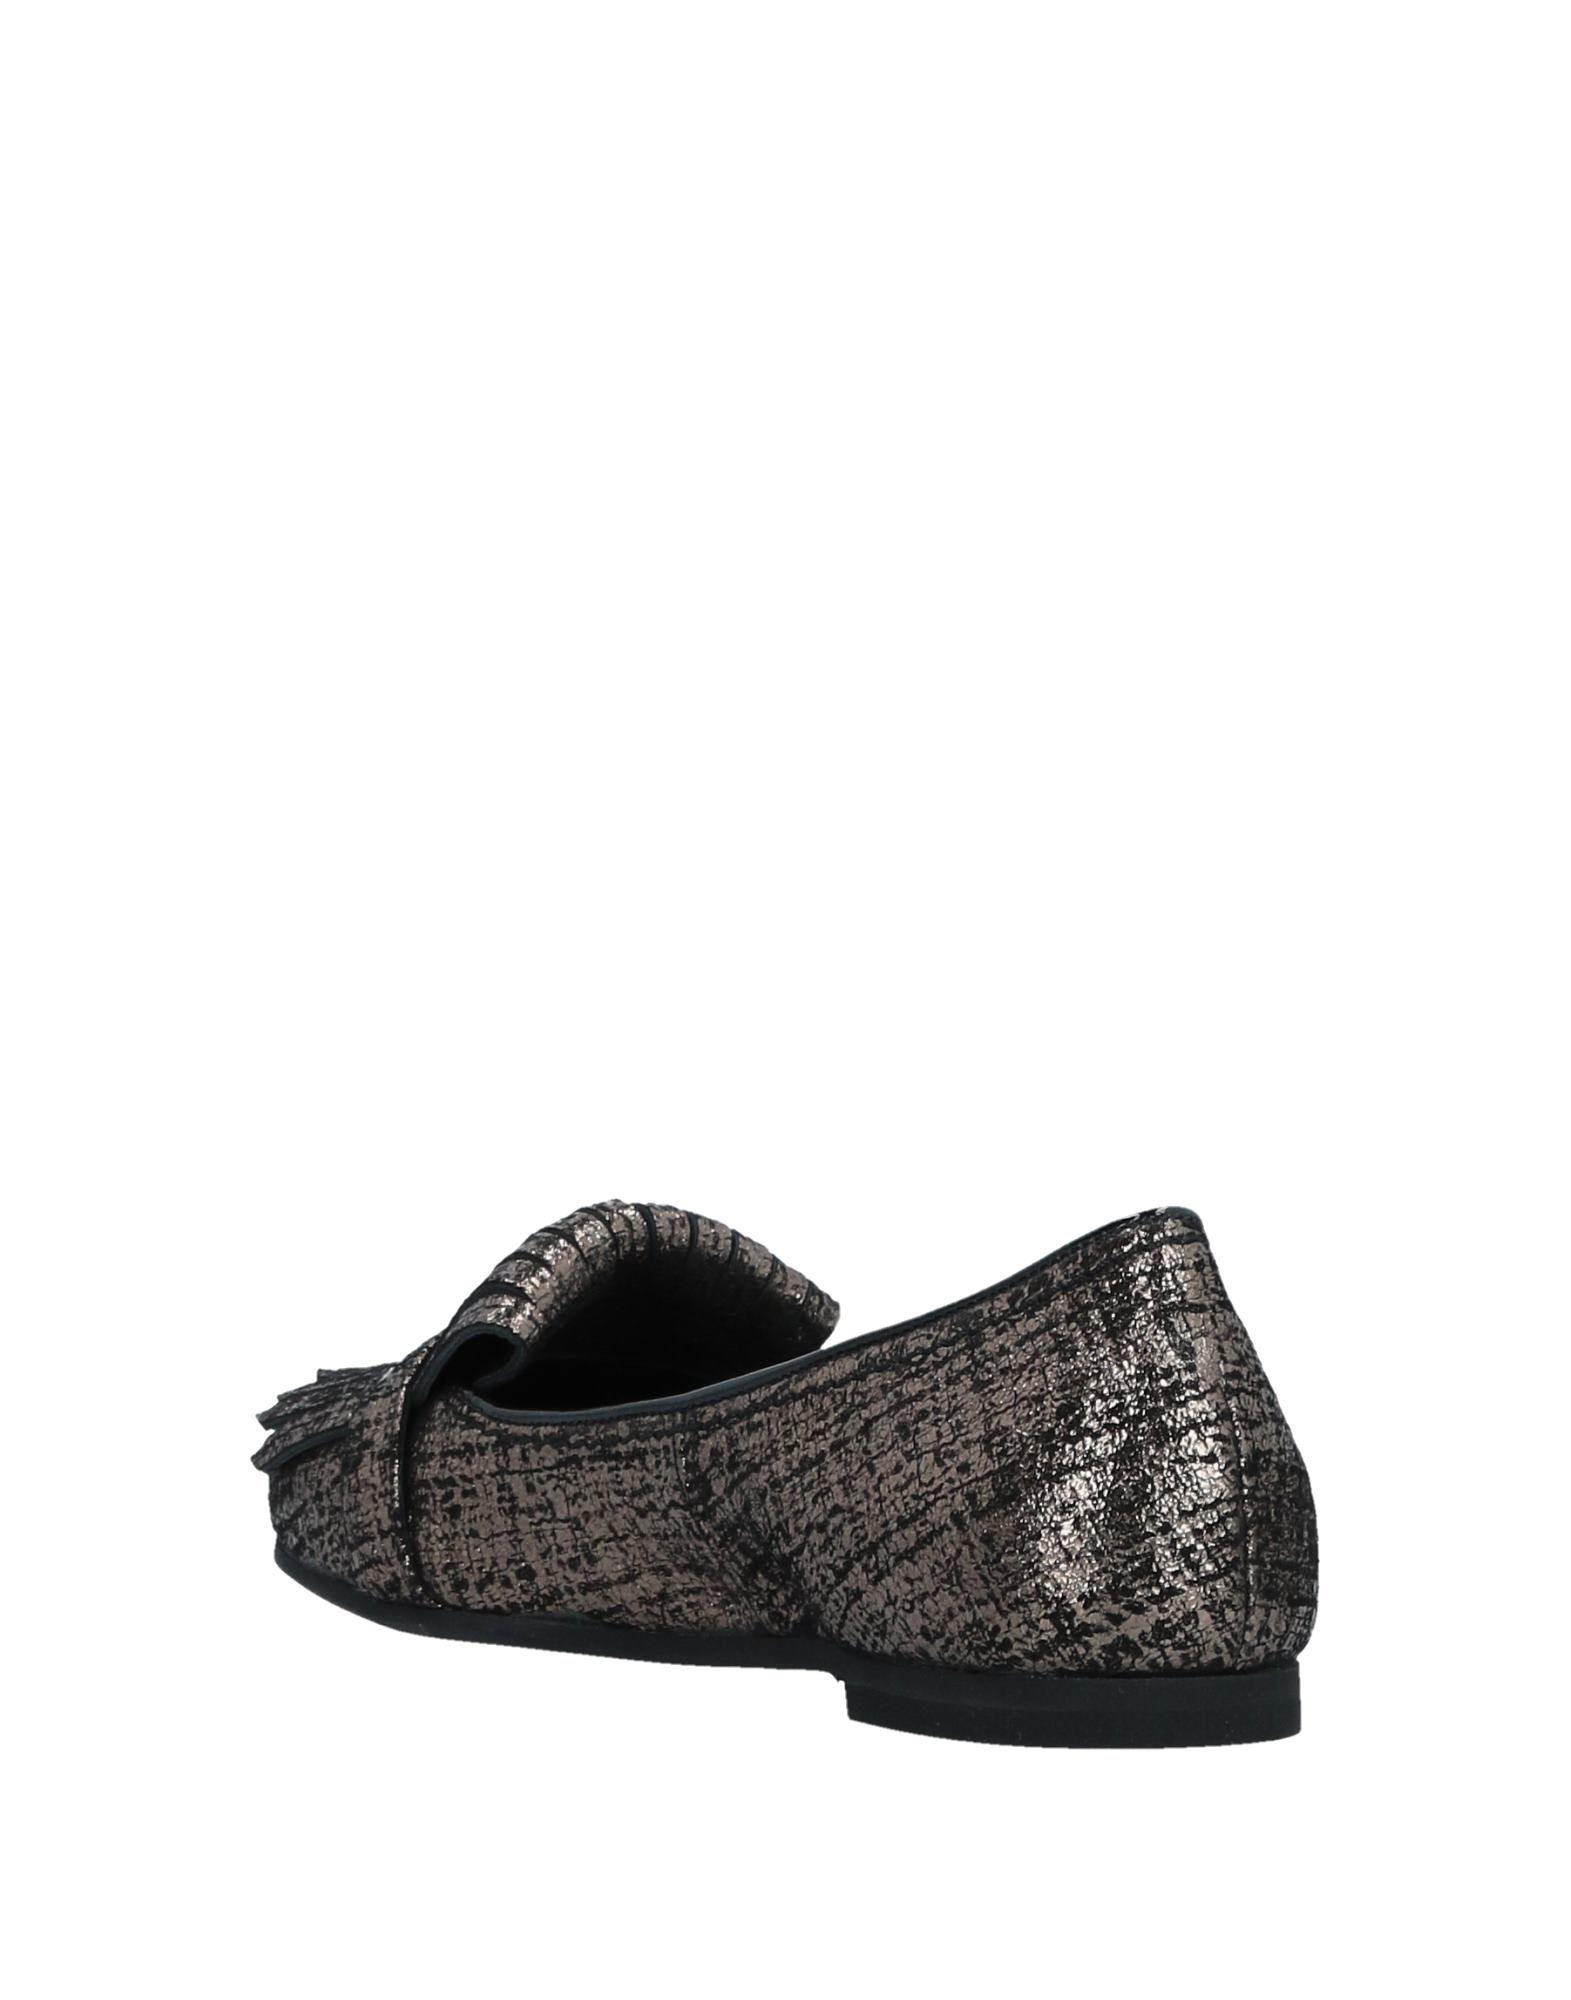 F.Lli 11520080QVGut Bruglia Mokassins Damen  11520080QVGut F.Lli aussehende strapazierfähige Schuhe 6af4ec